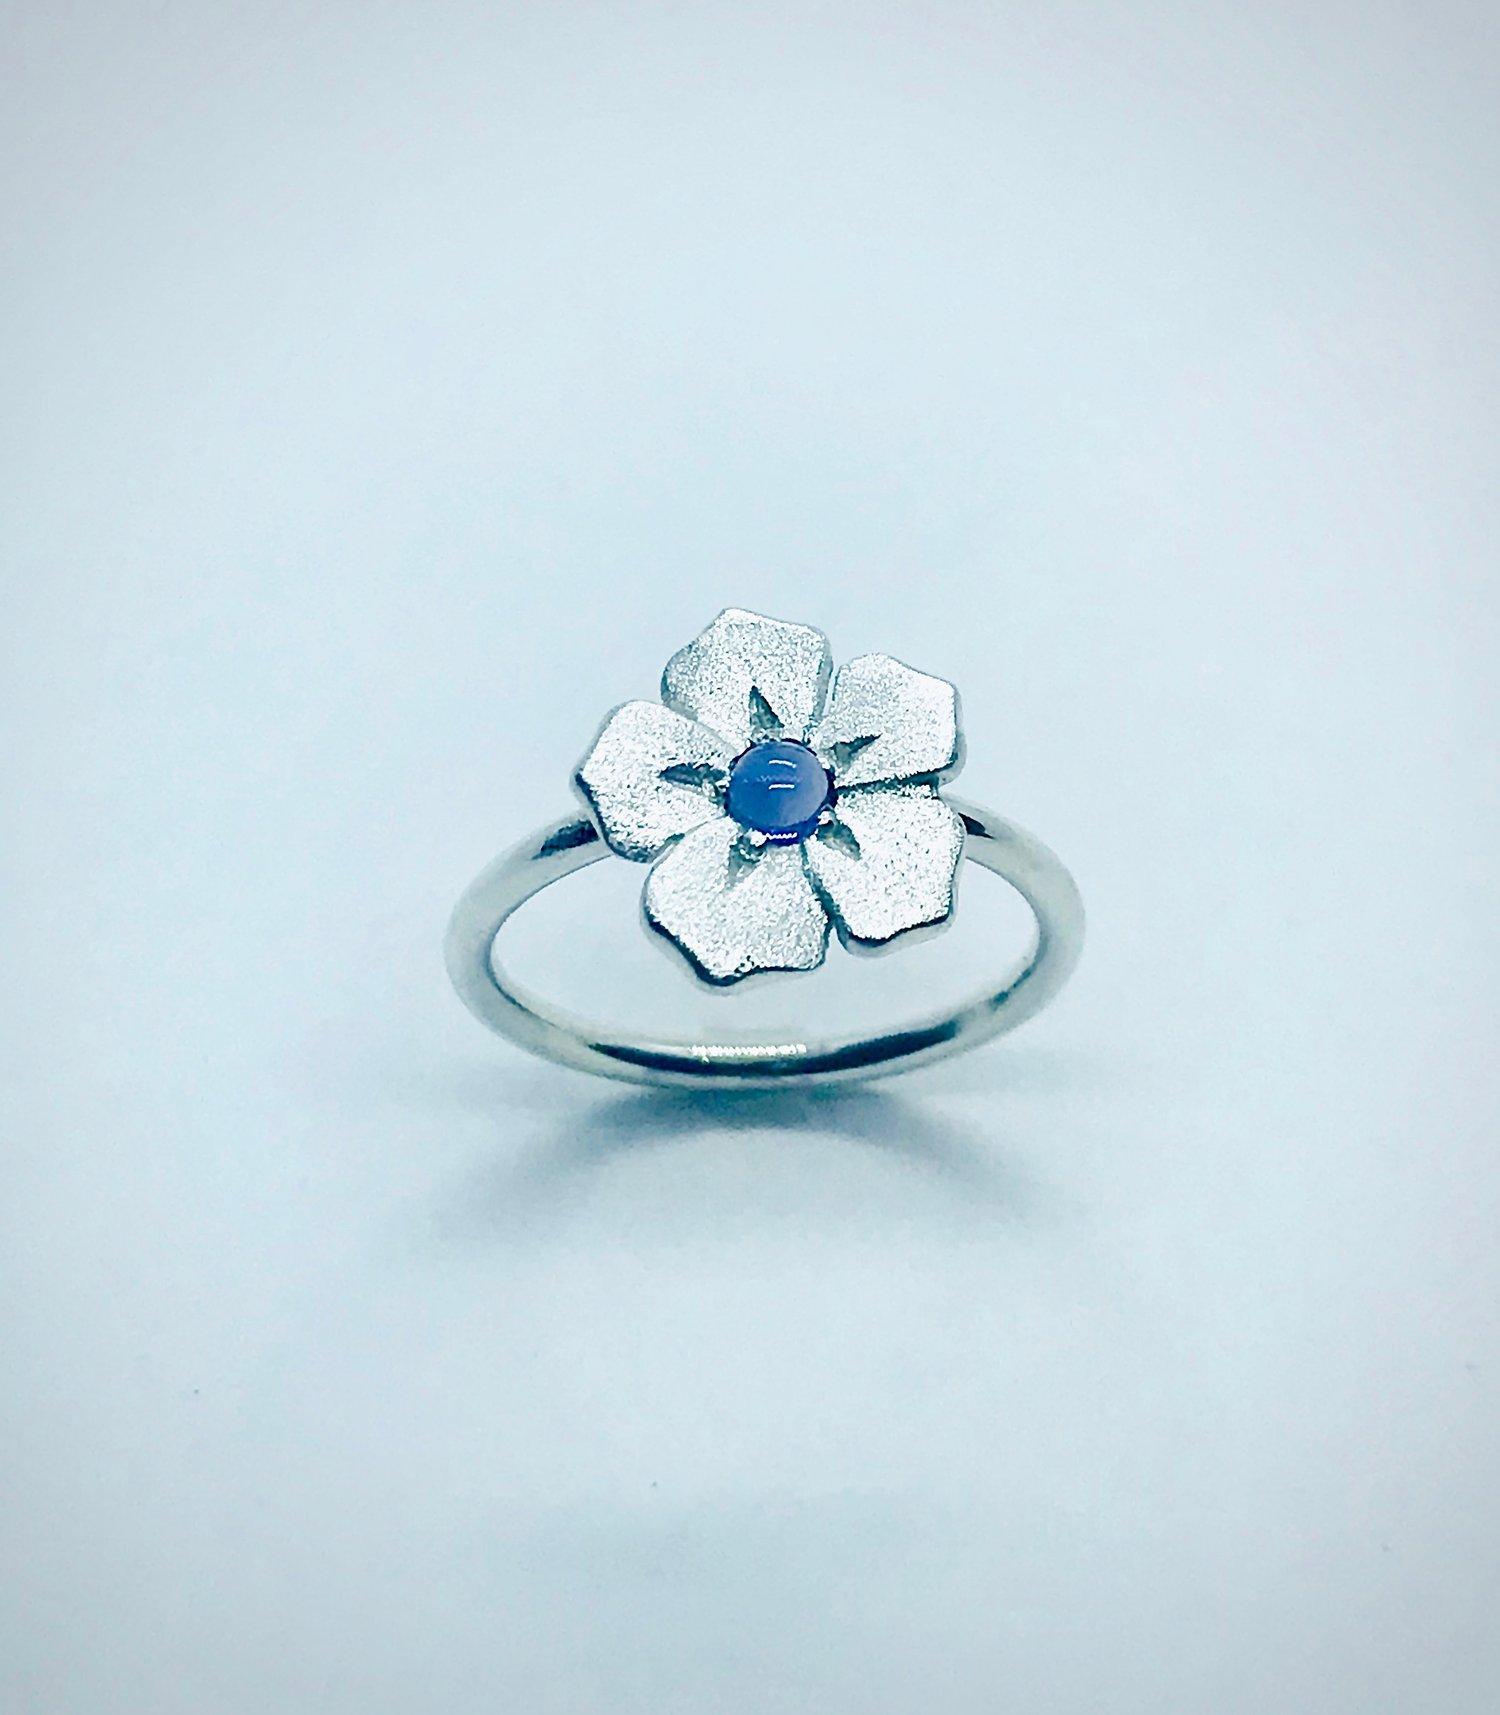 Image of Phlox Ring